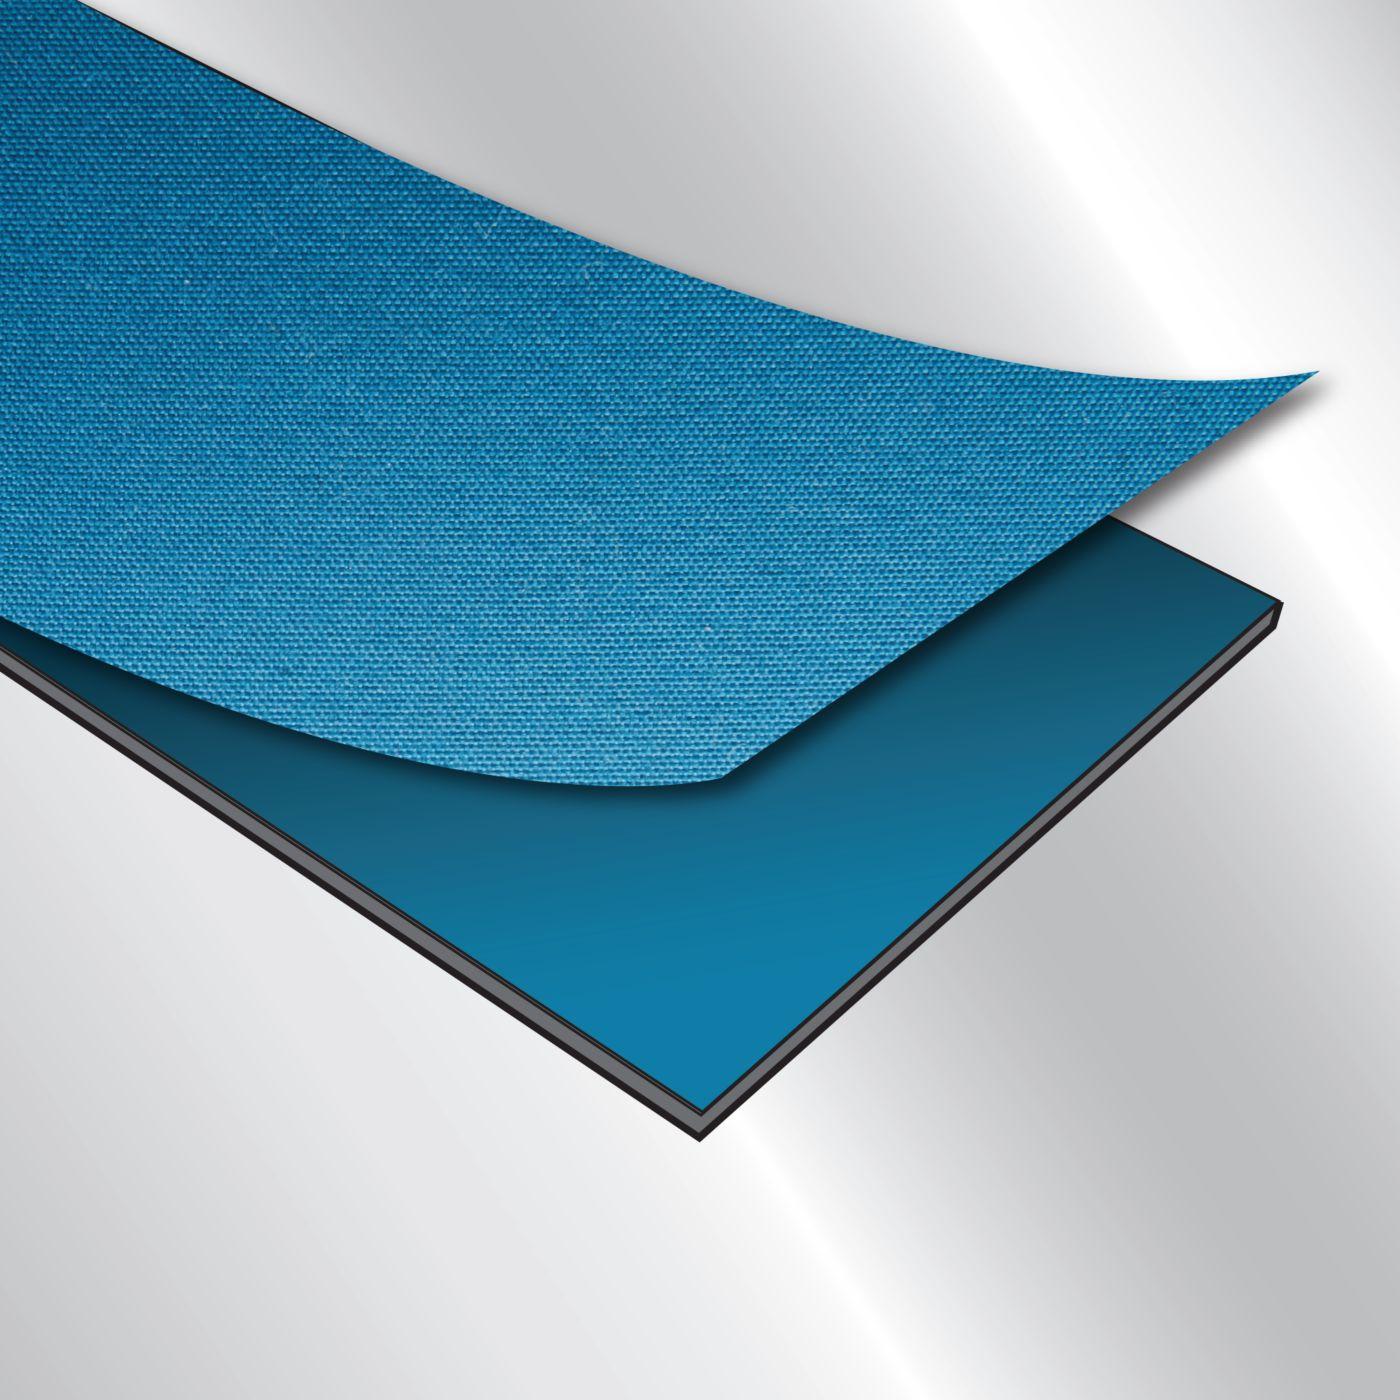 durarest plus single high airbed u2013 queen - Airbeds